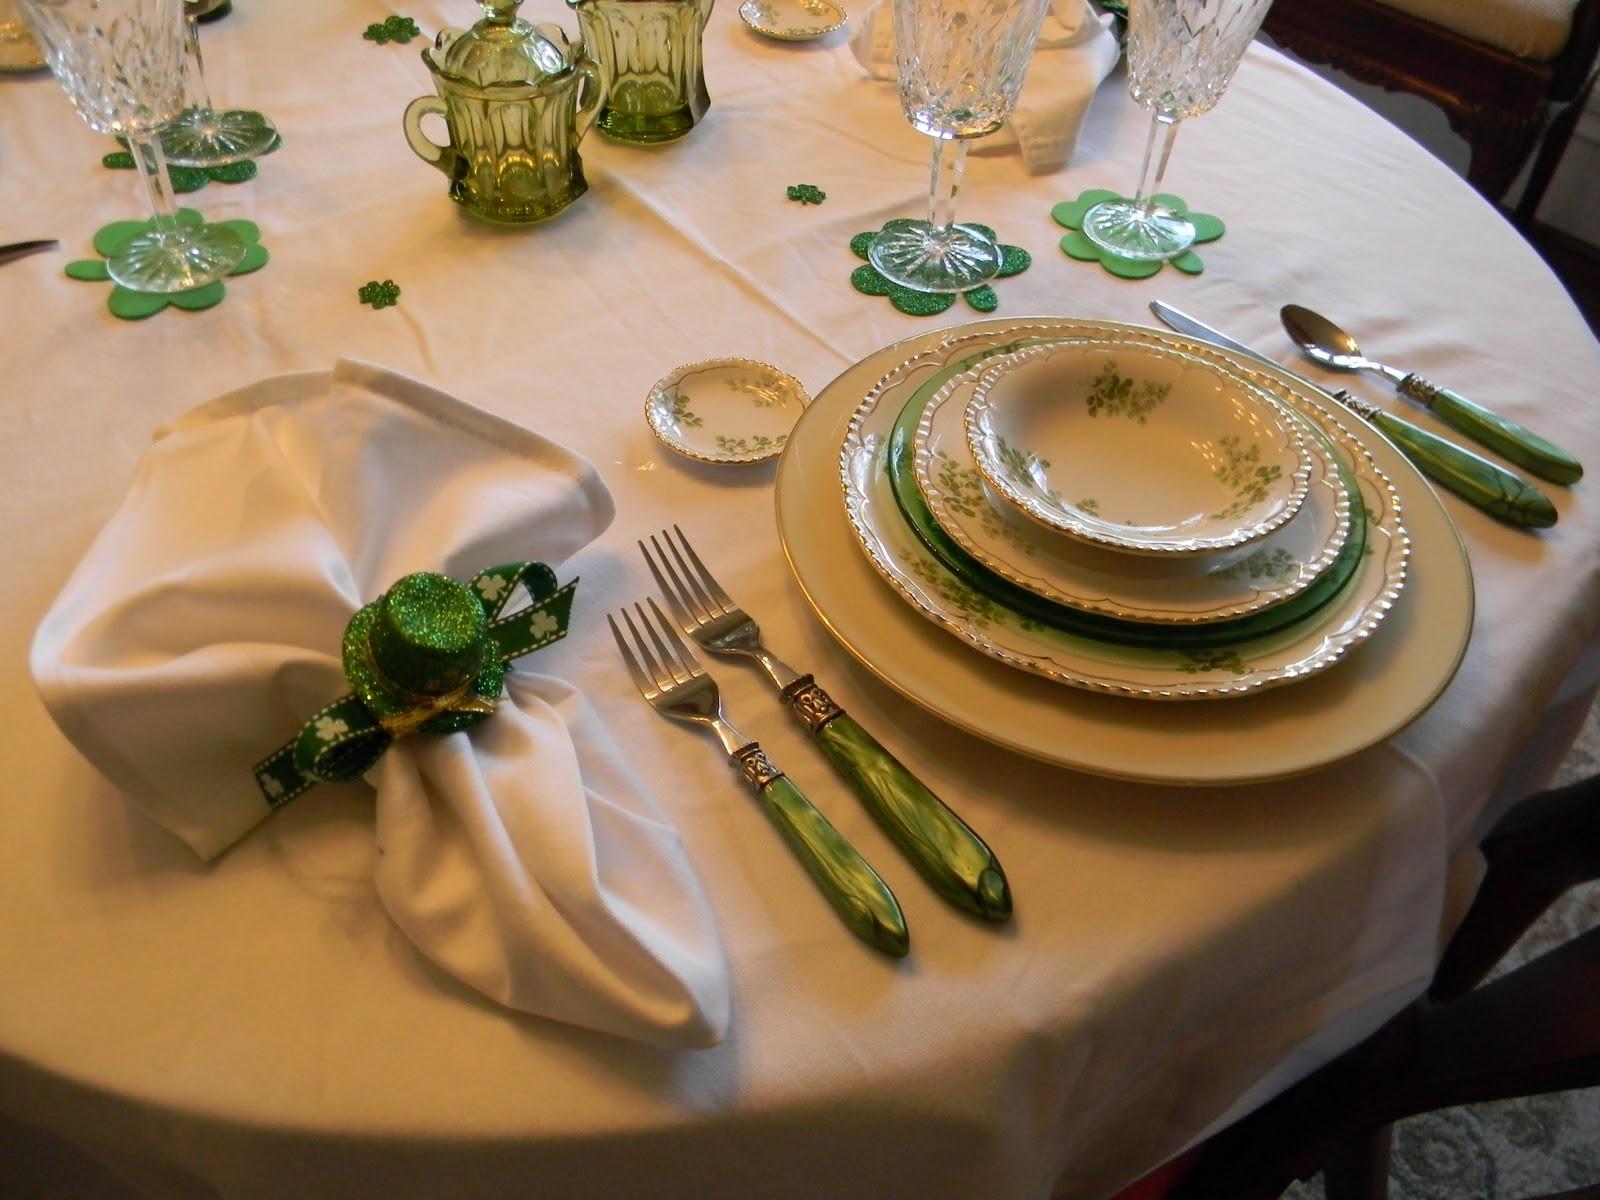 St Patricks Day Dinner  A Toile Tale Saint Patrick s Day Dinner